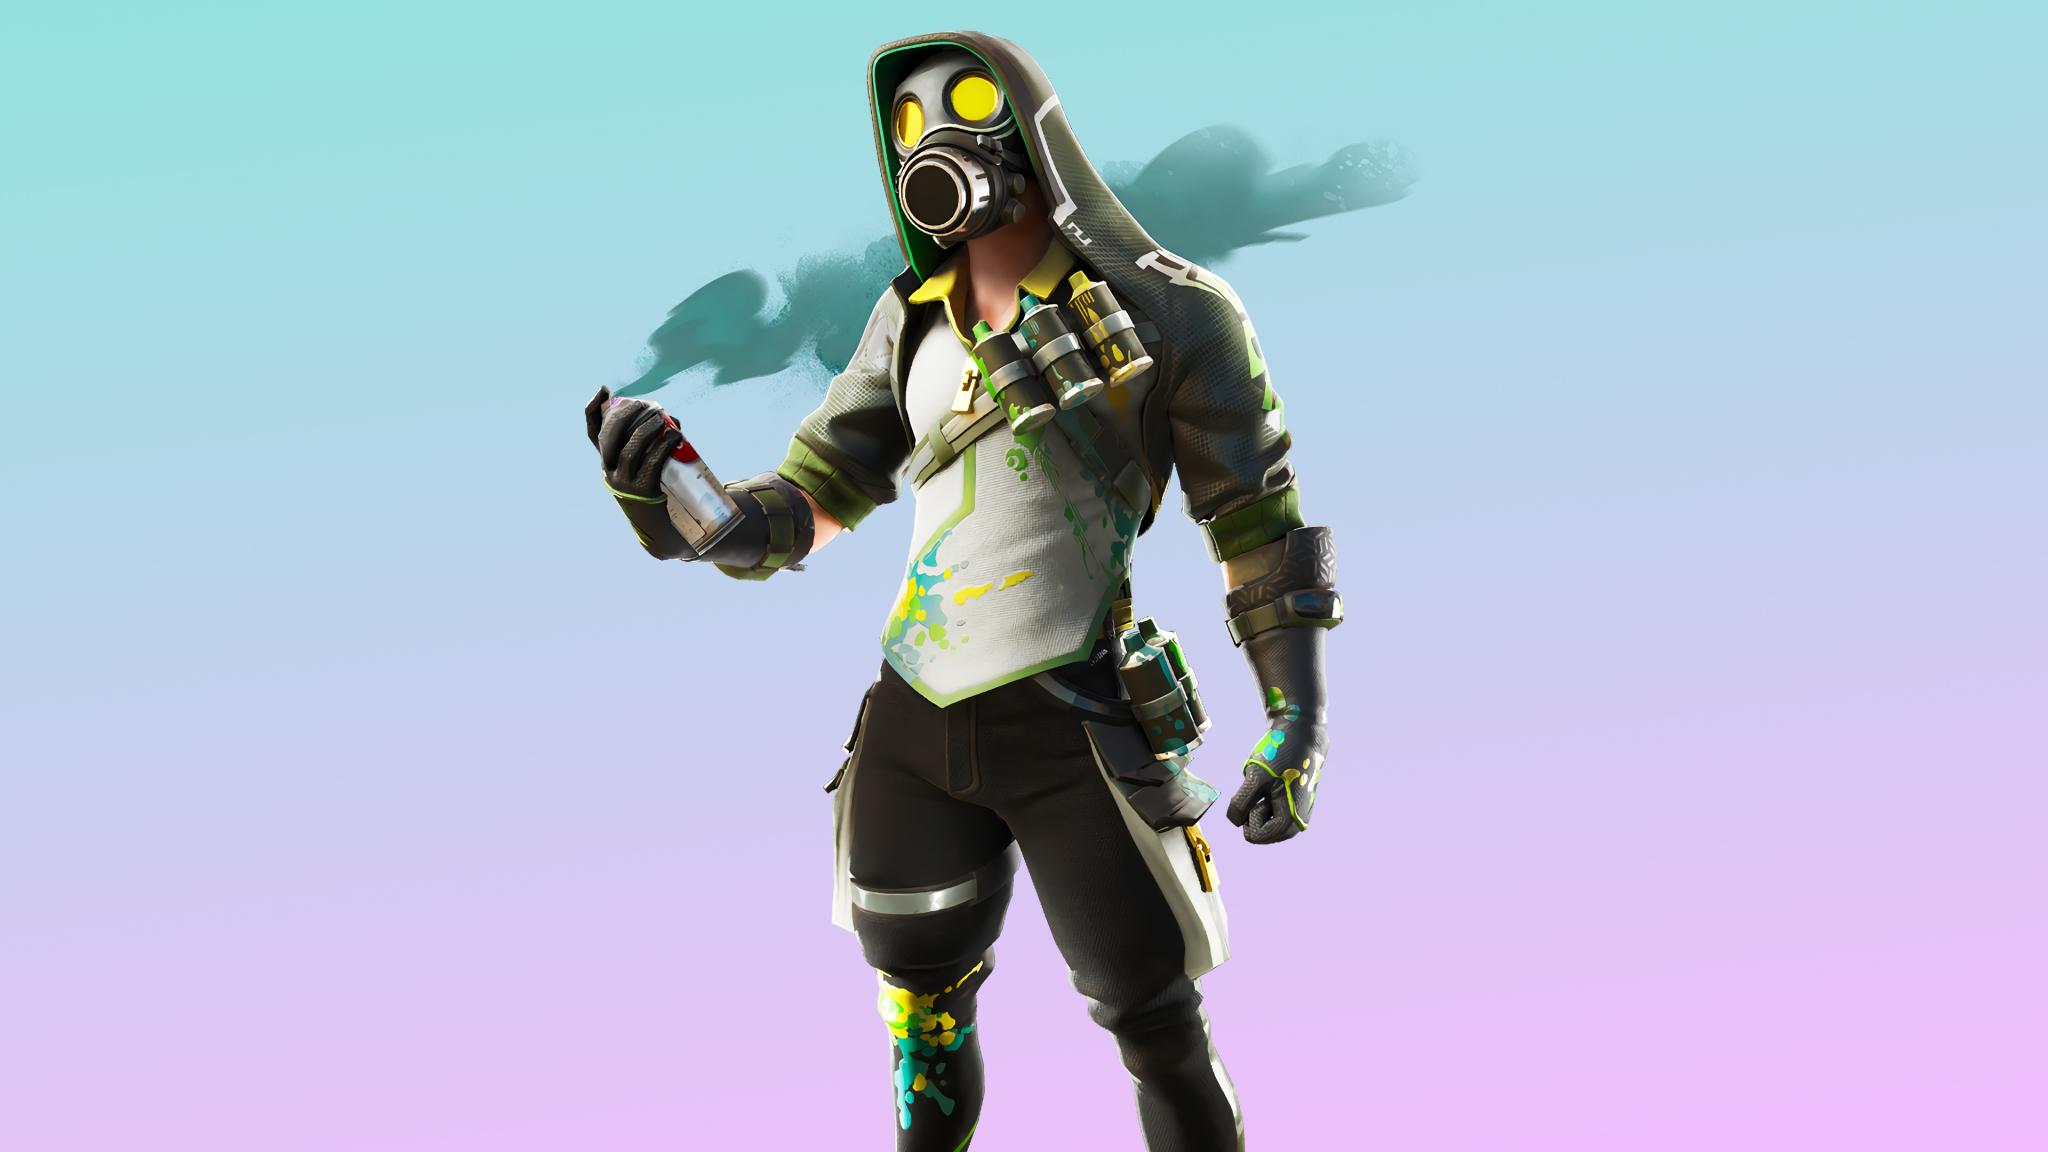 2048x1152 Toxic Tagger Fortnite 2048x1152 Resolution